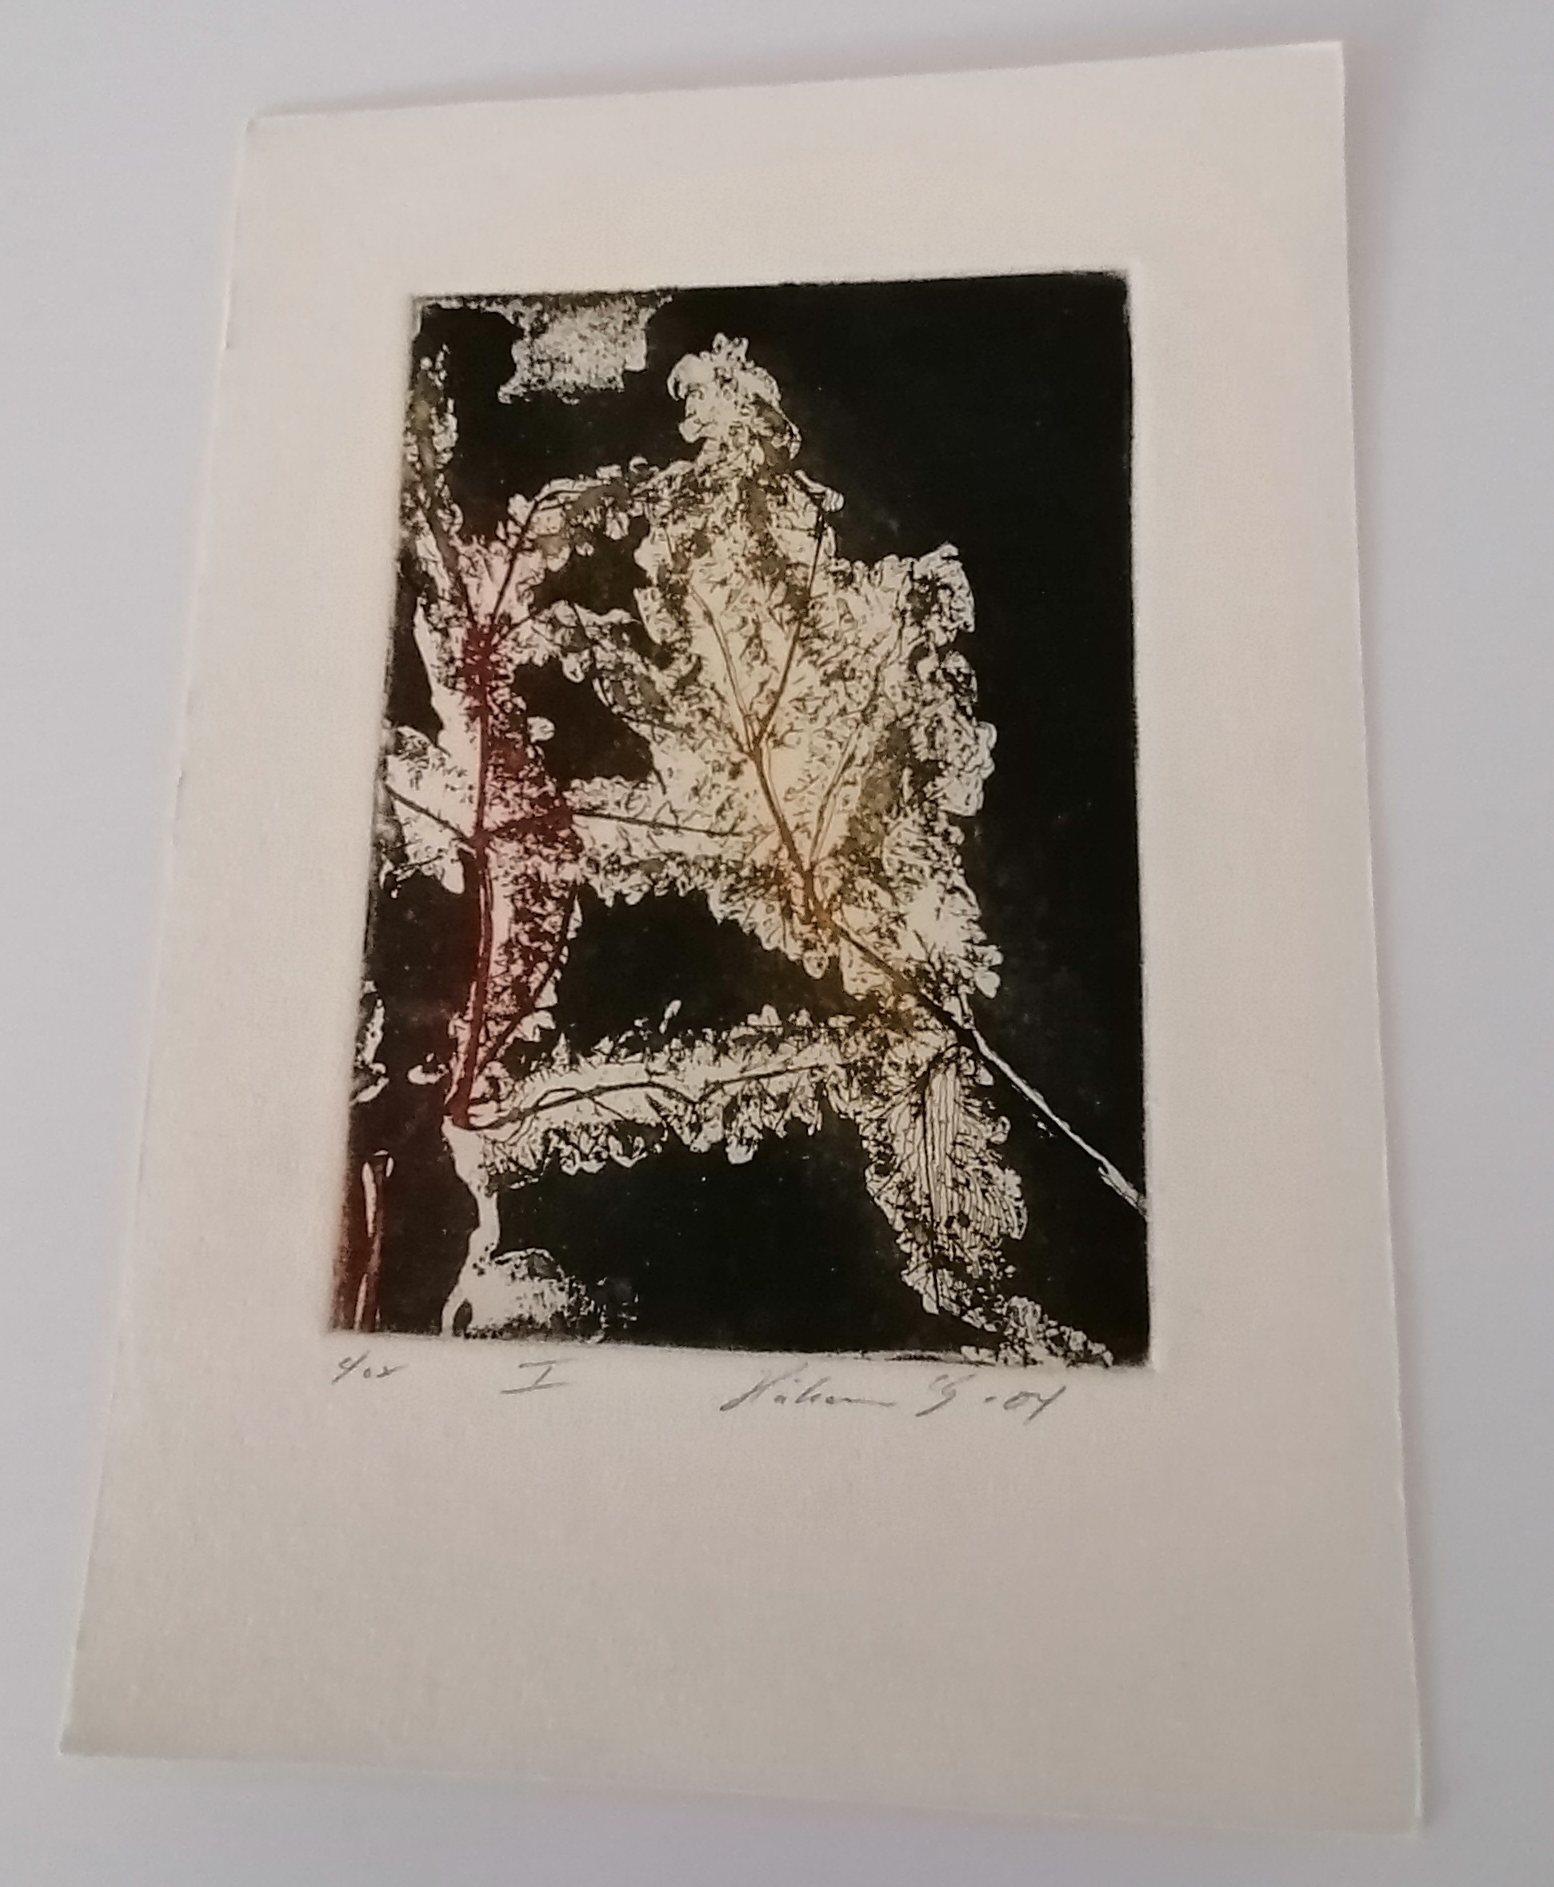 https://www.norstamps.com/content/images/stamps/gtgallerier/196.jpg